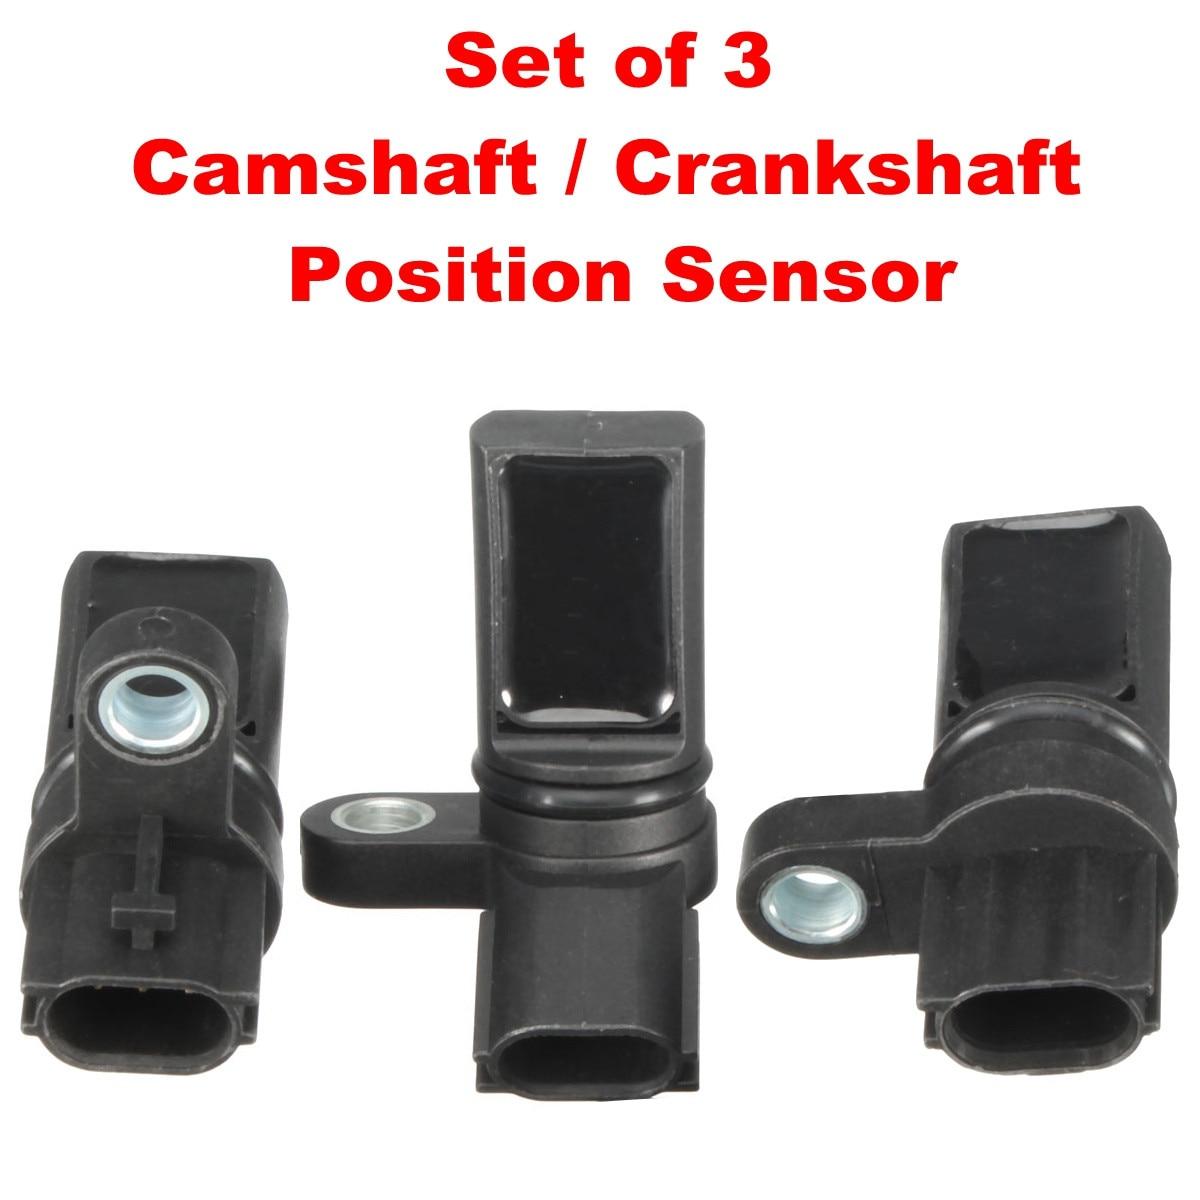 Crankshaft Position Sensor Reviews